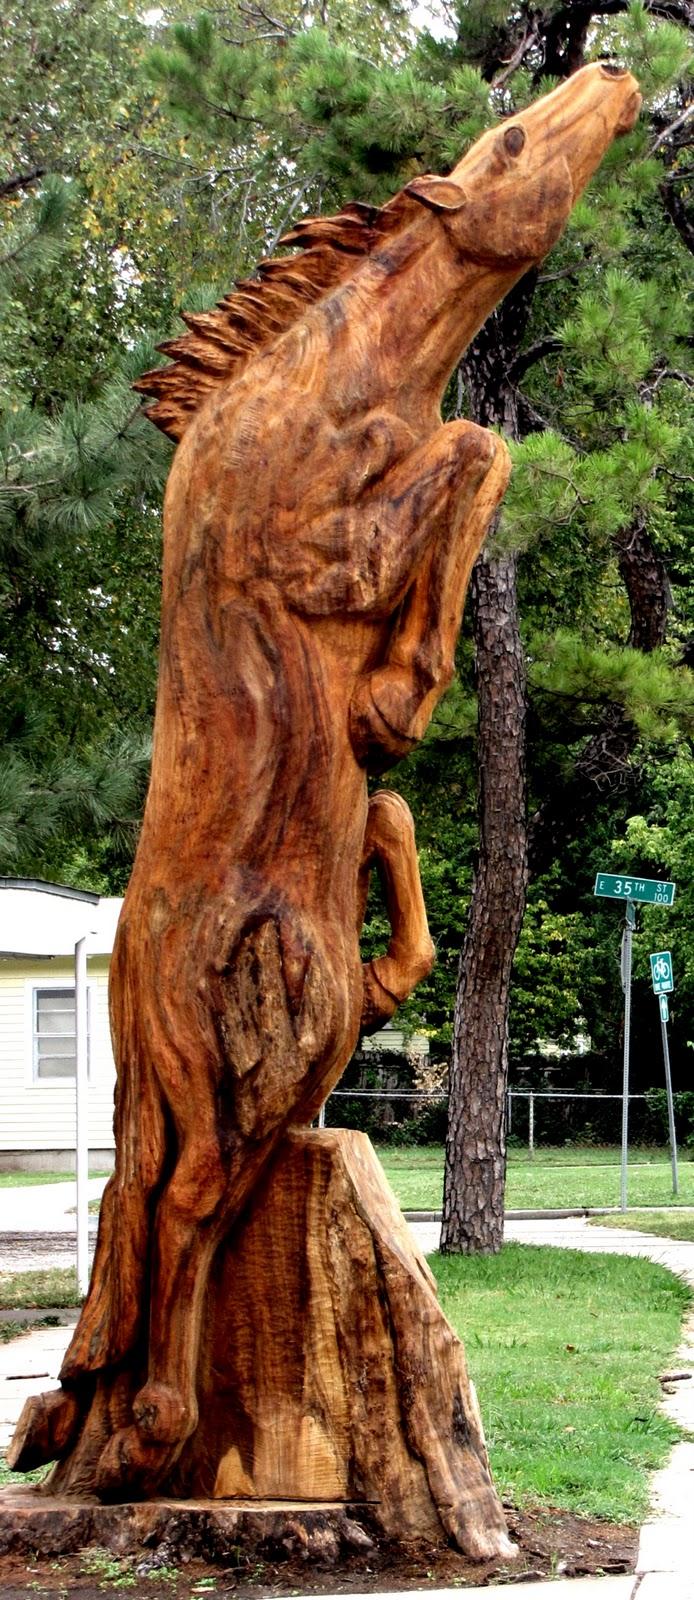 Tulsa gentleman chainsaw carving wild horses